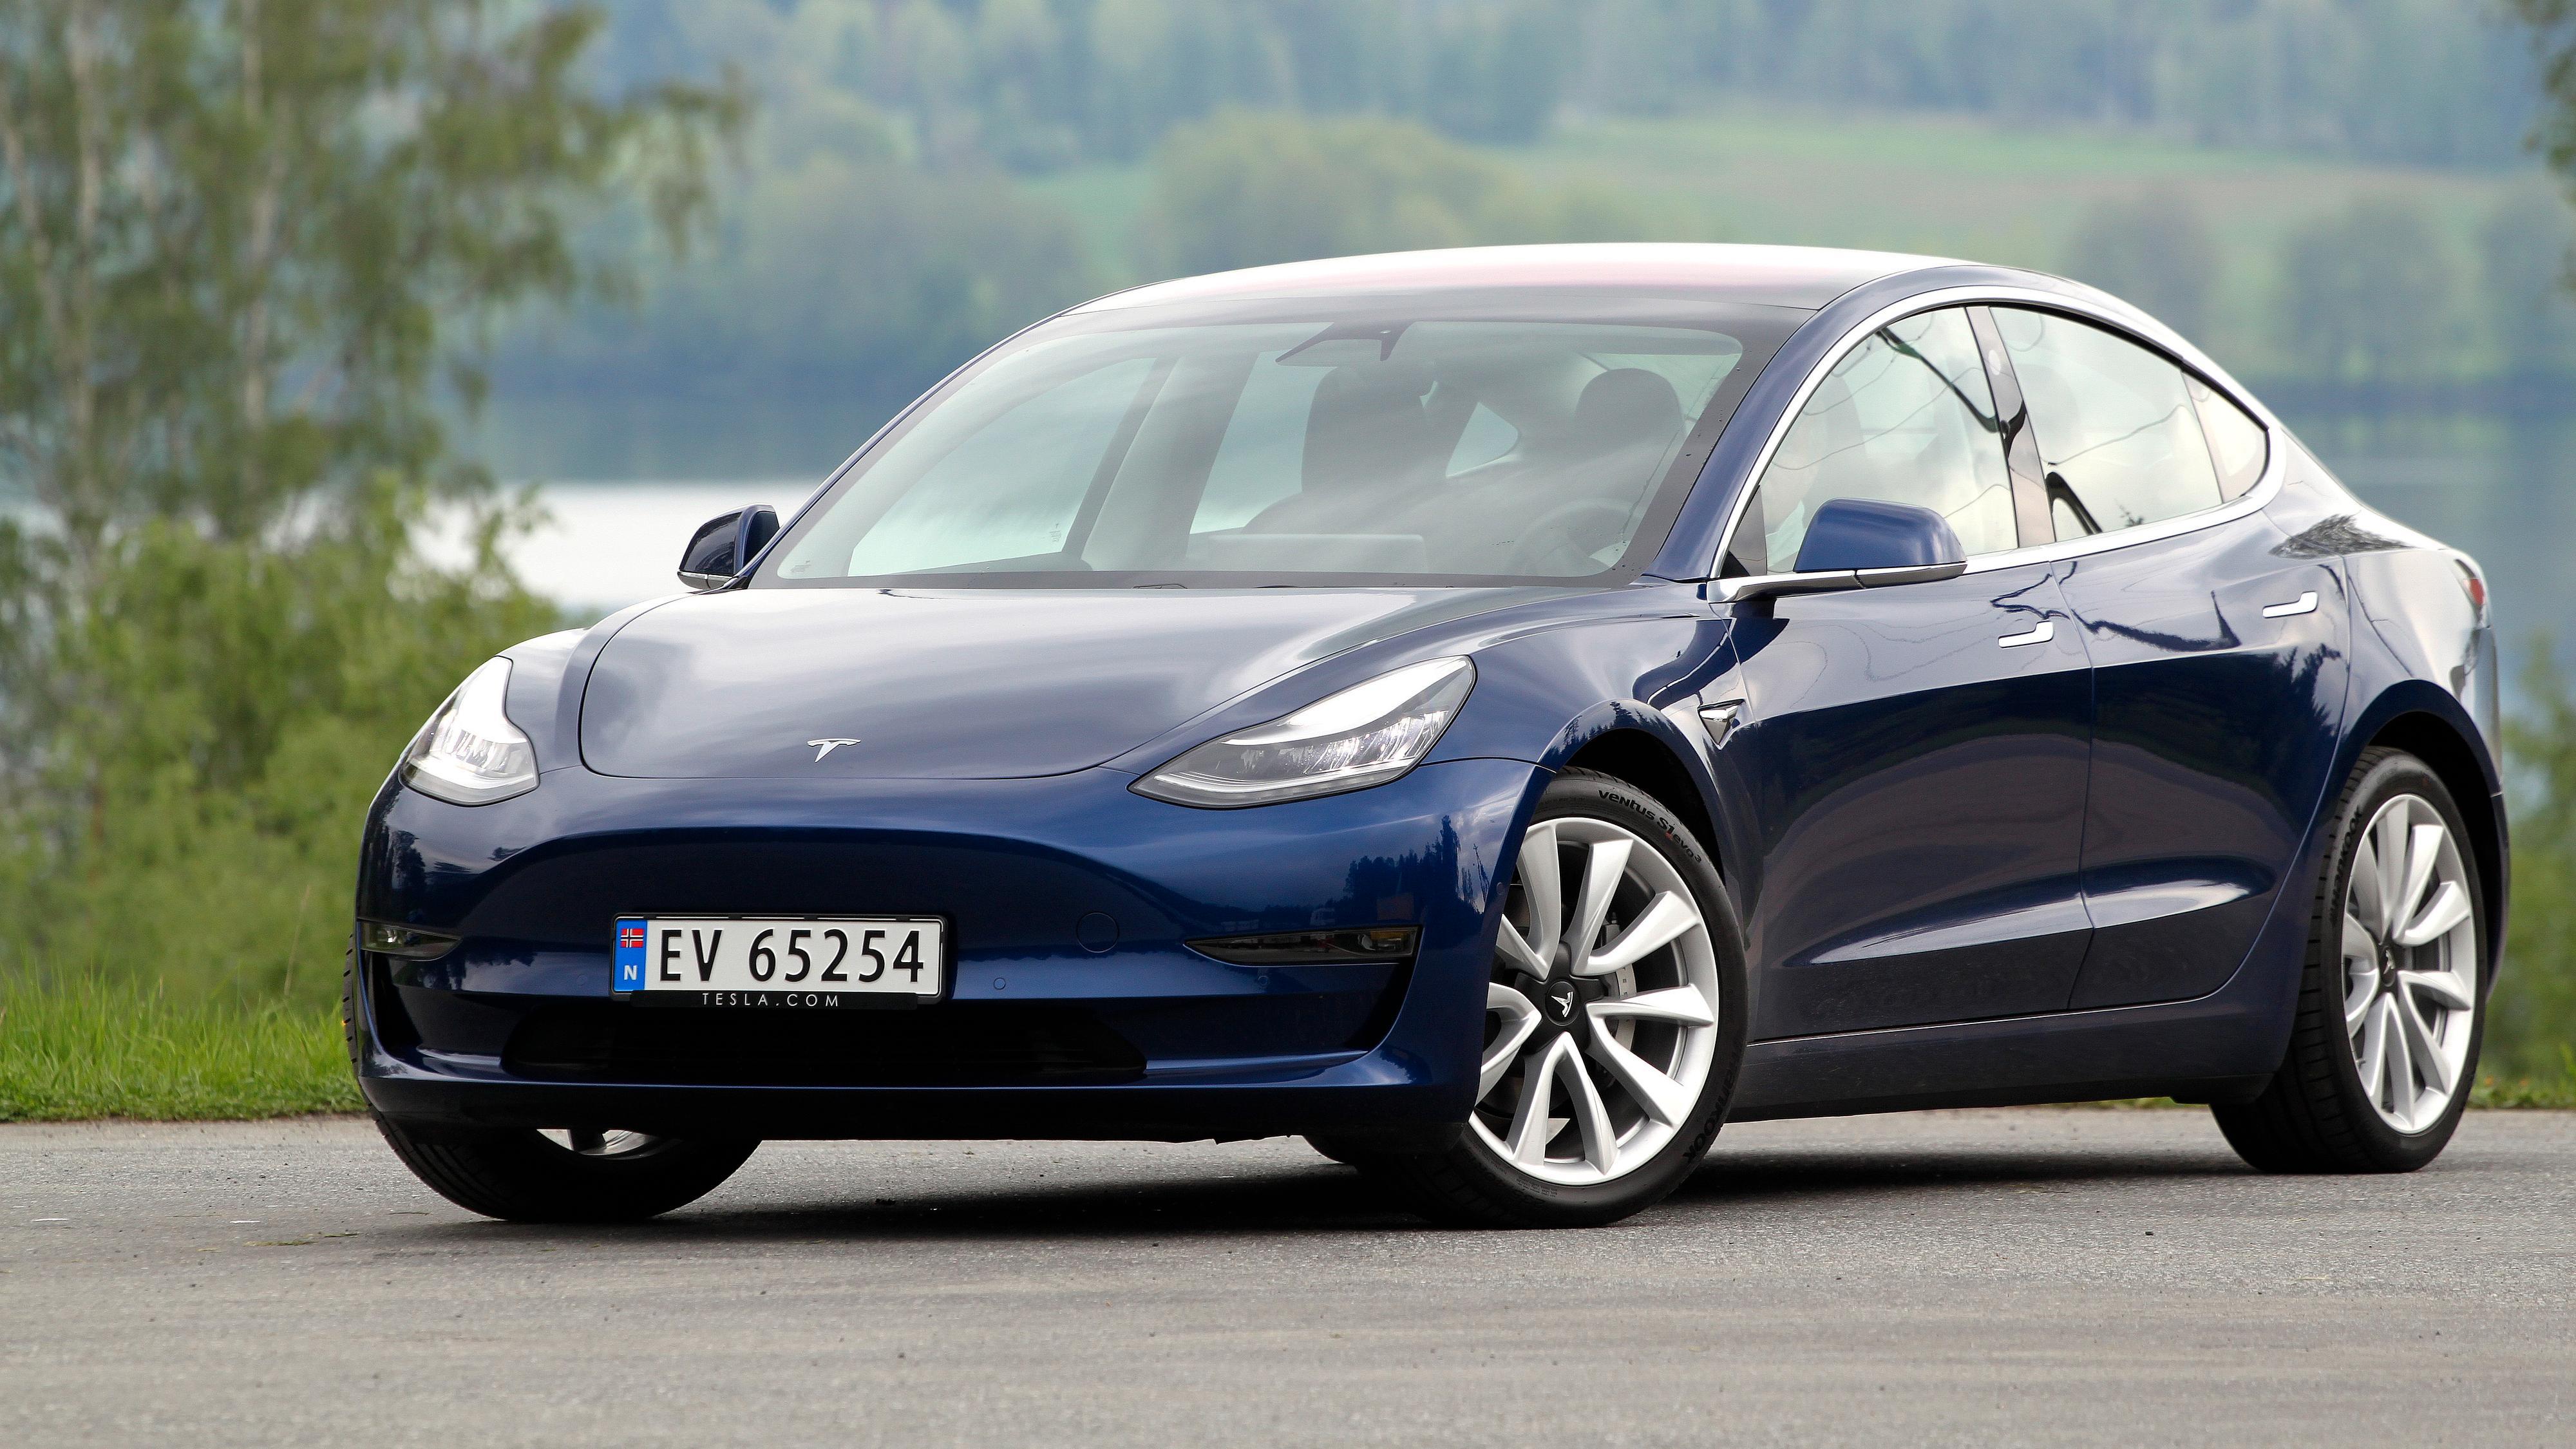 Tesla-salget har falt med 97 prosent siden i fjor